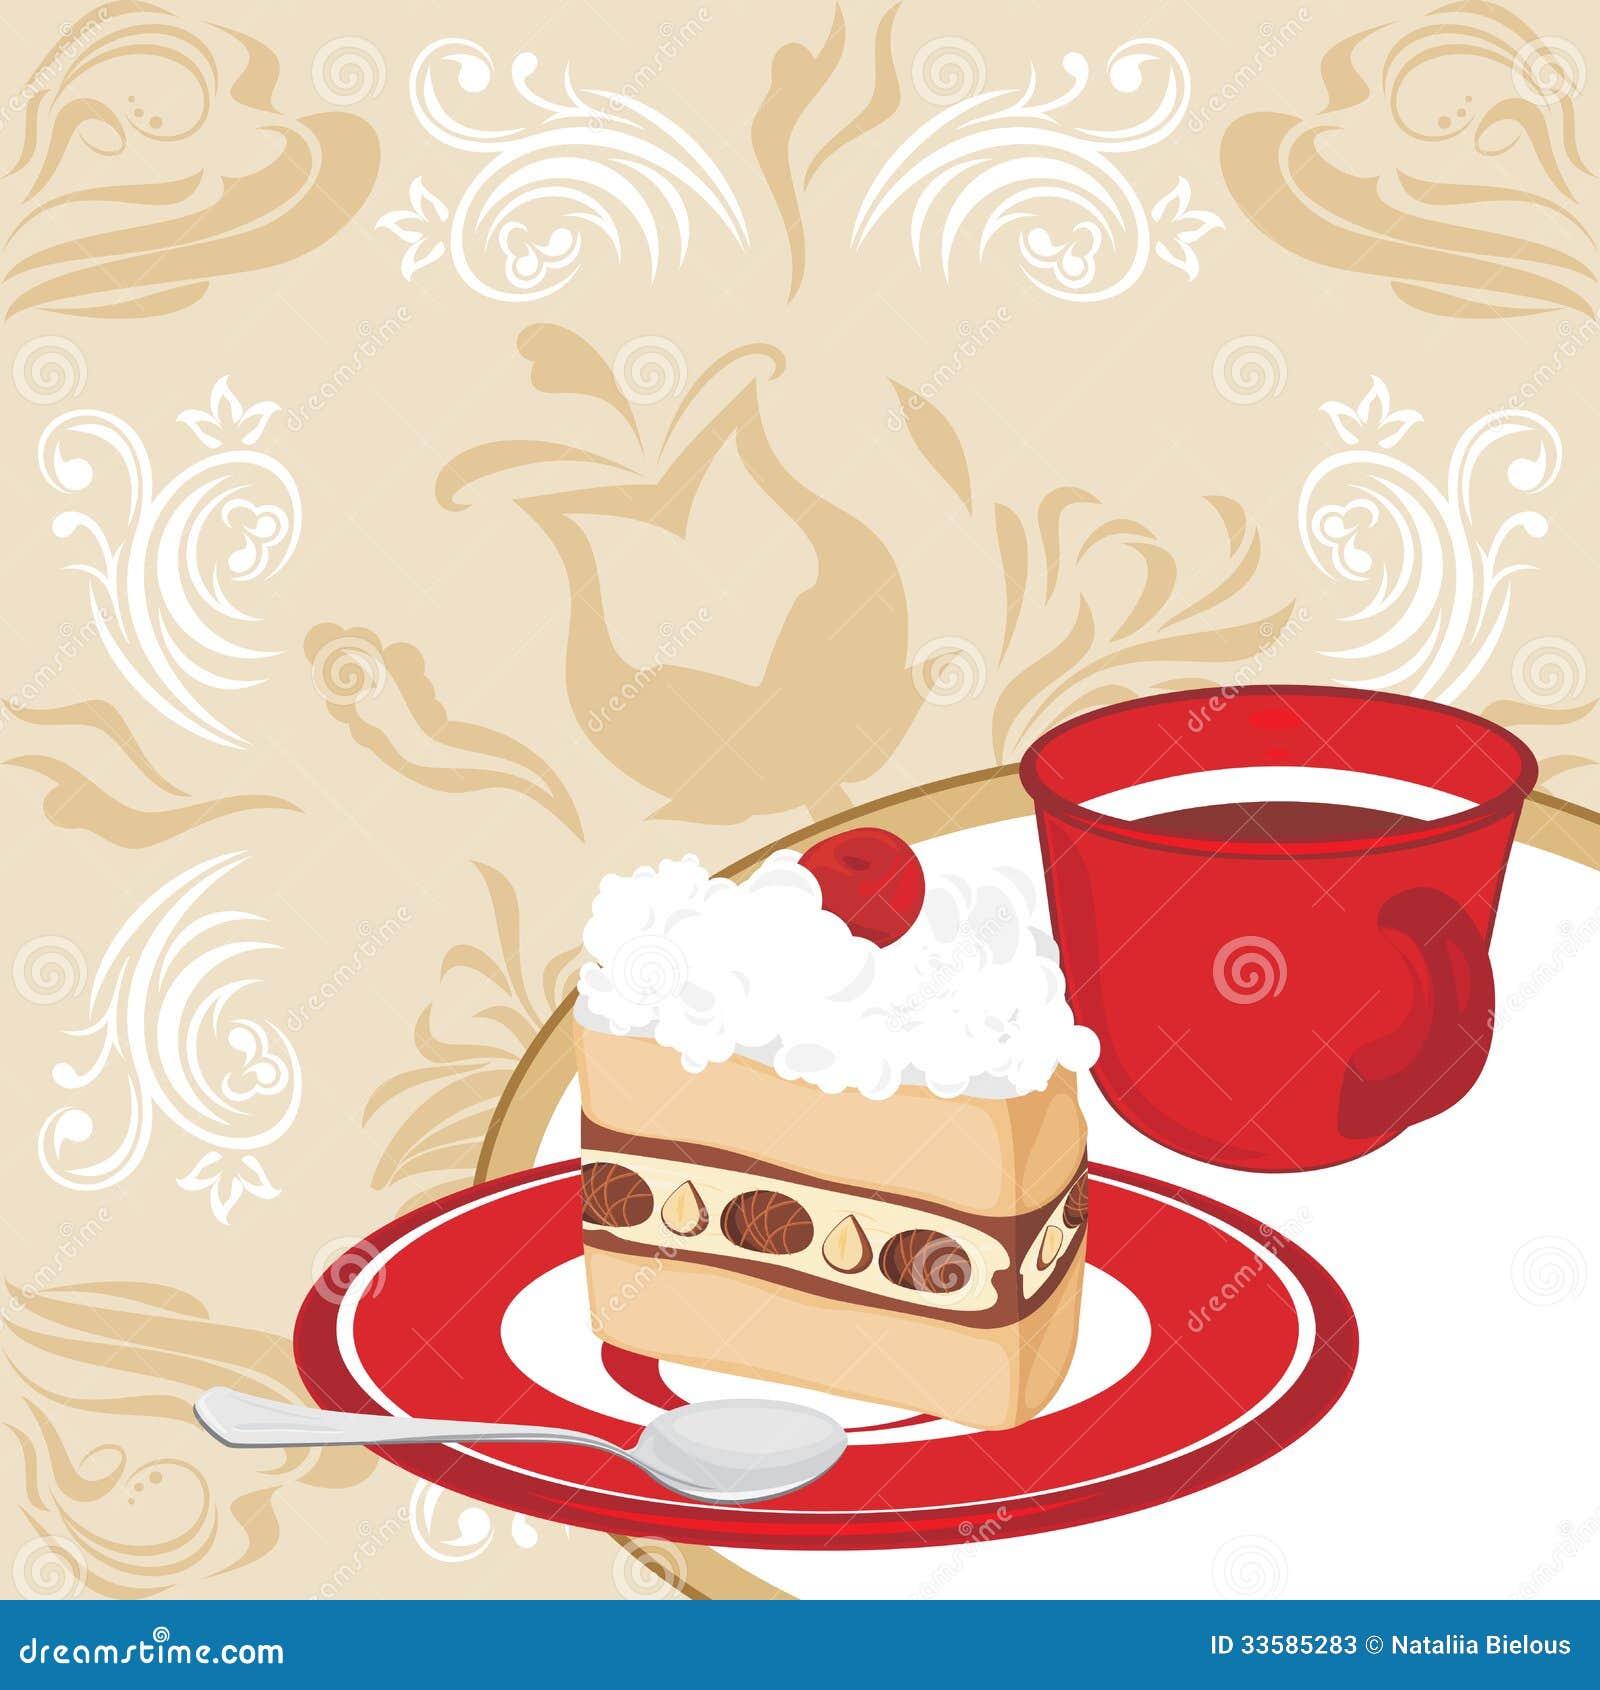 Caffeine Free Chocolate Cake